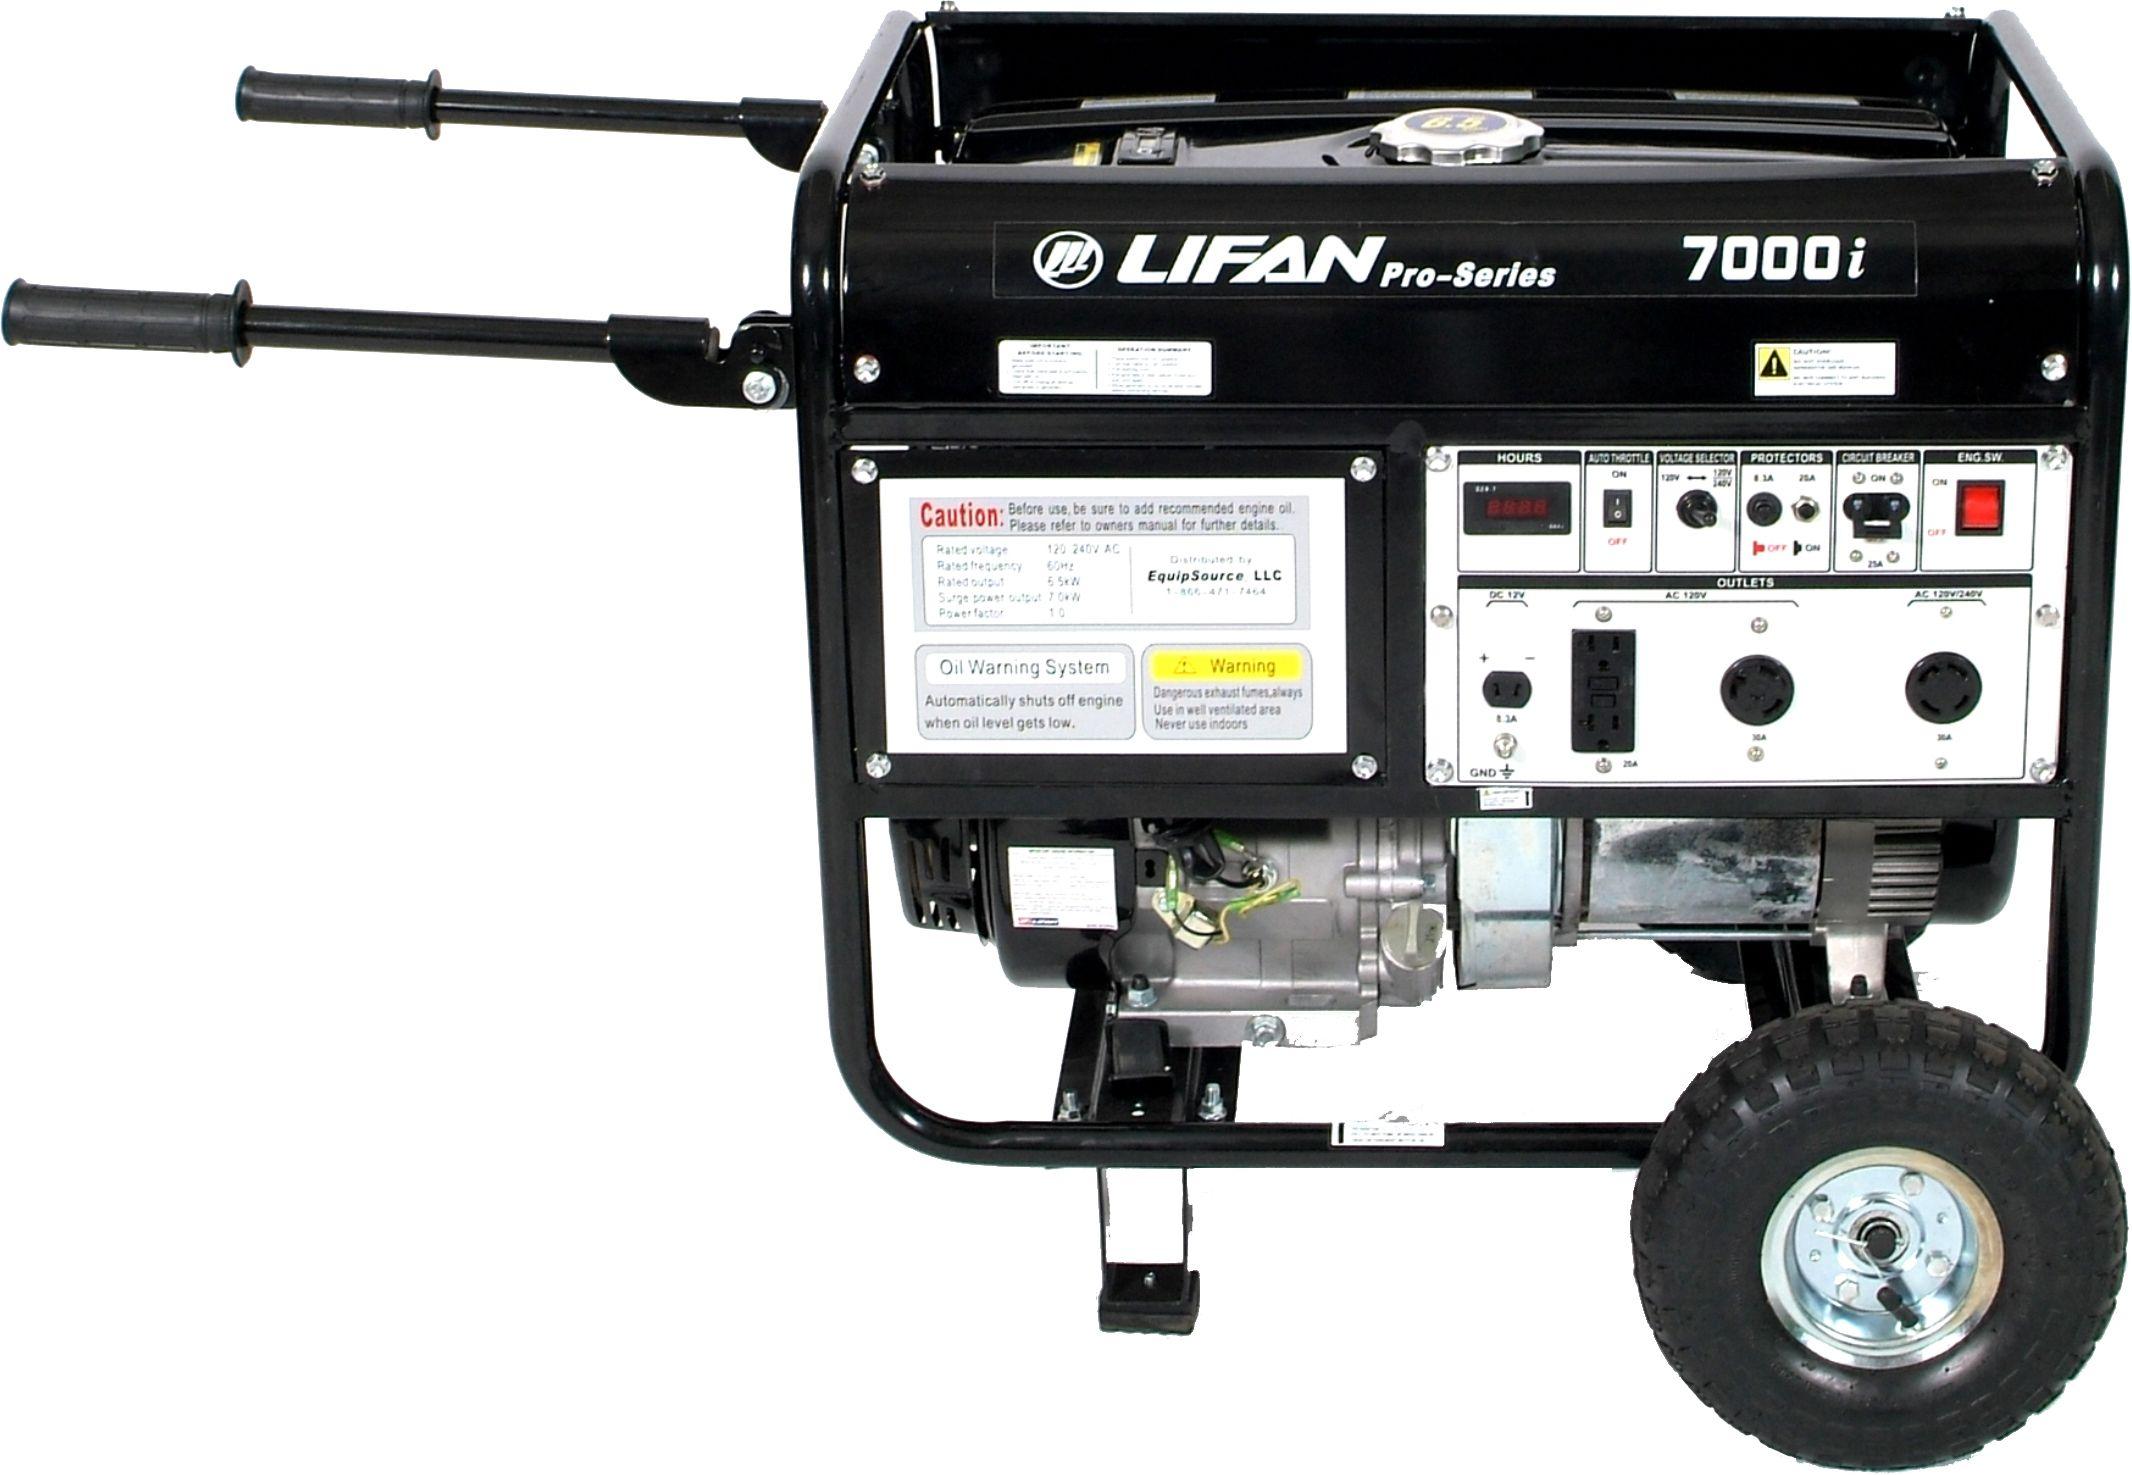 Lifan Generators 3600 Wiring Diagram - Trusted Wiring Diagram •